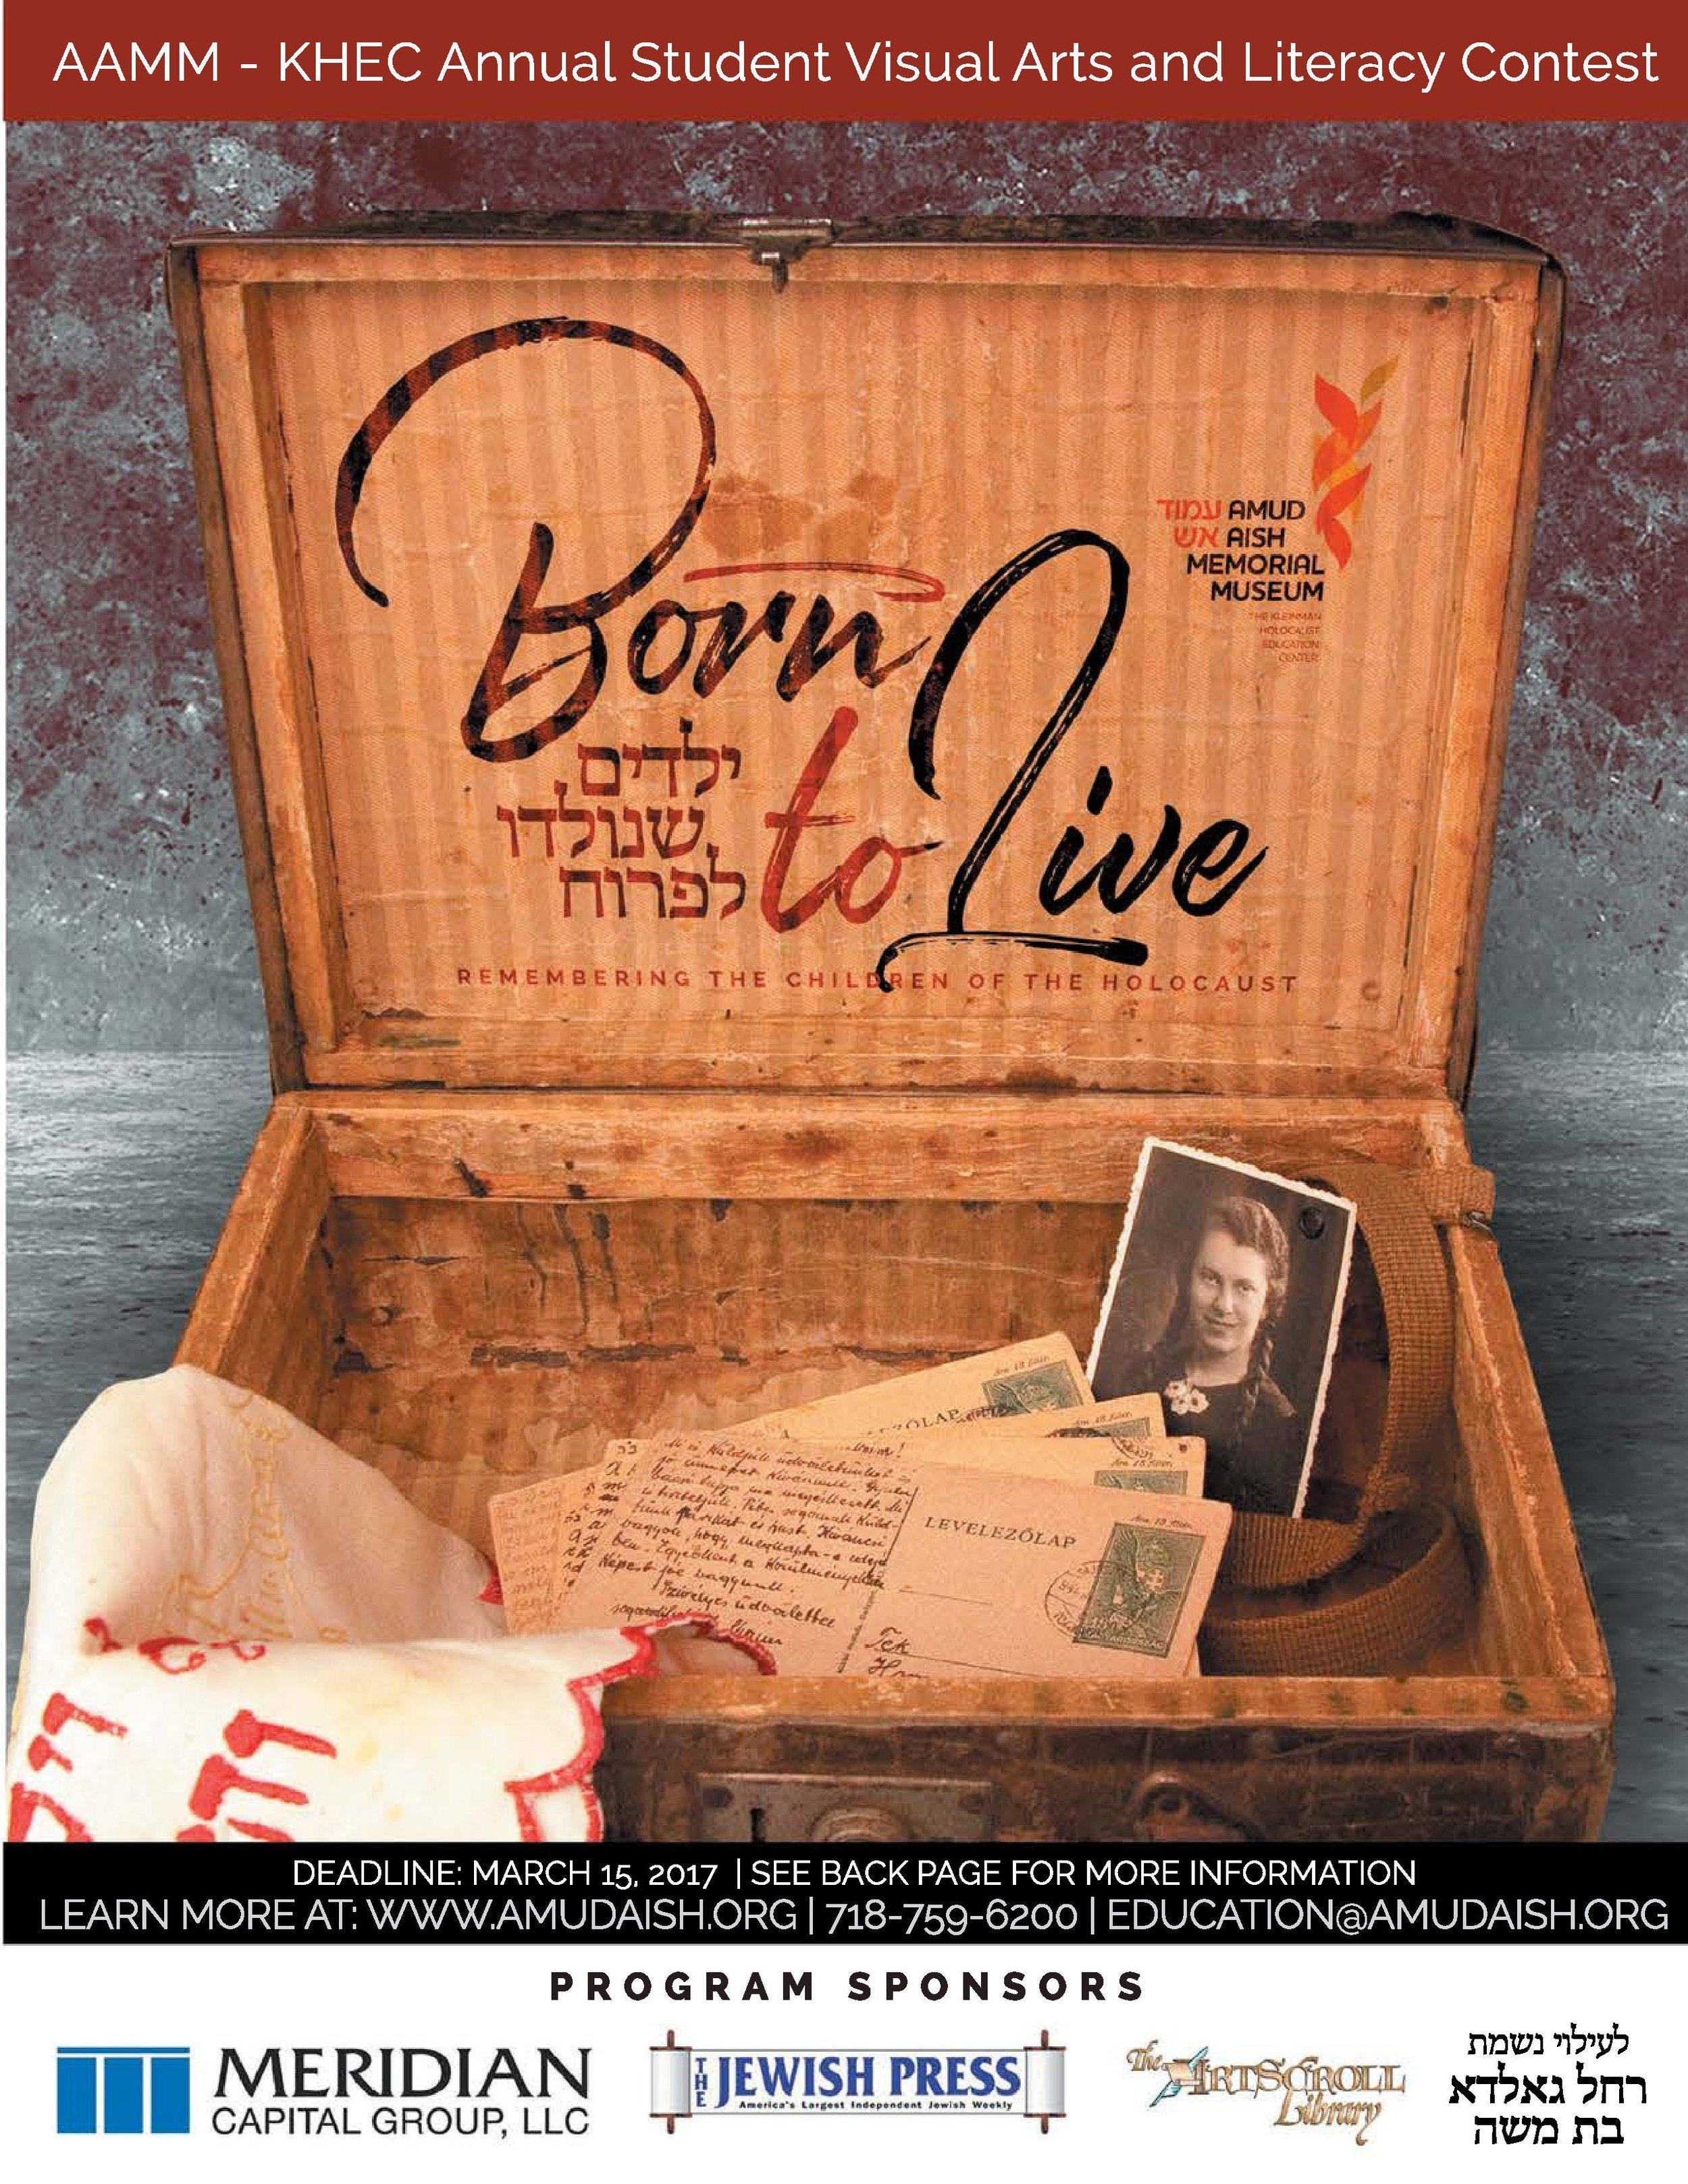 Born to live_Web version-1.jpg